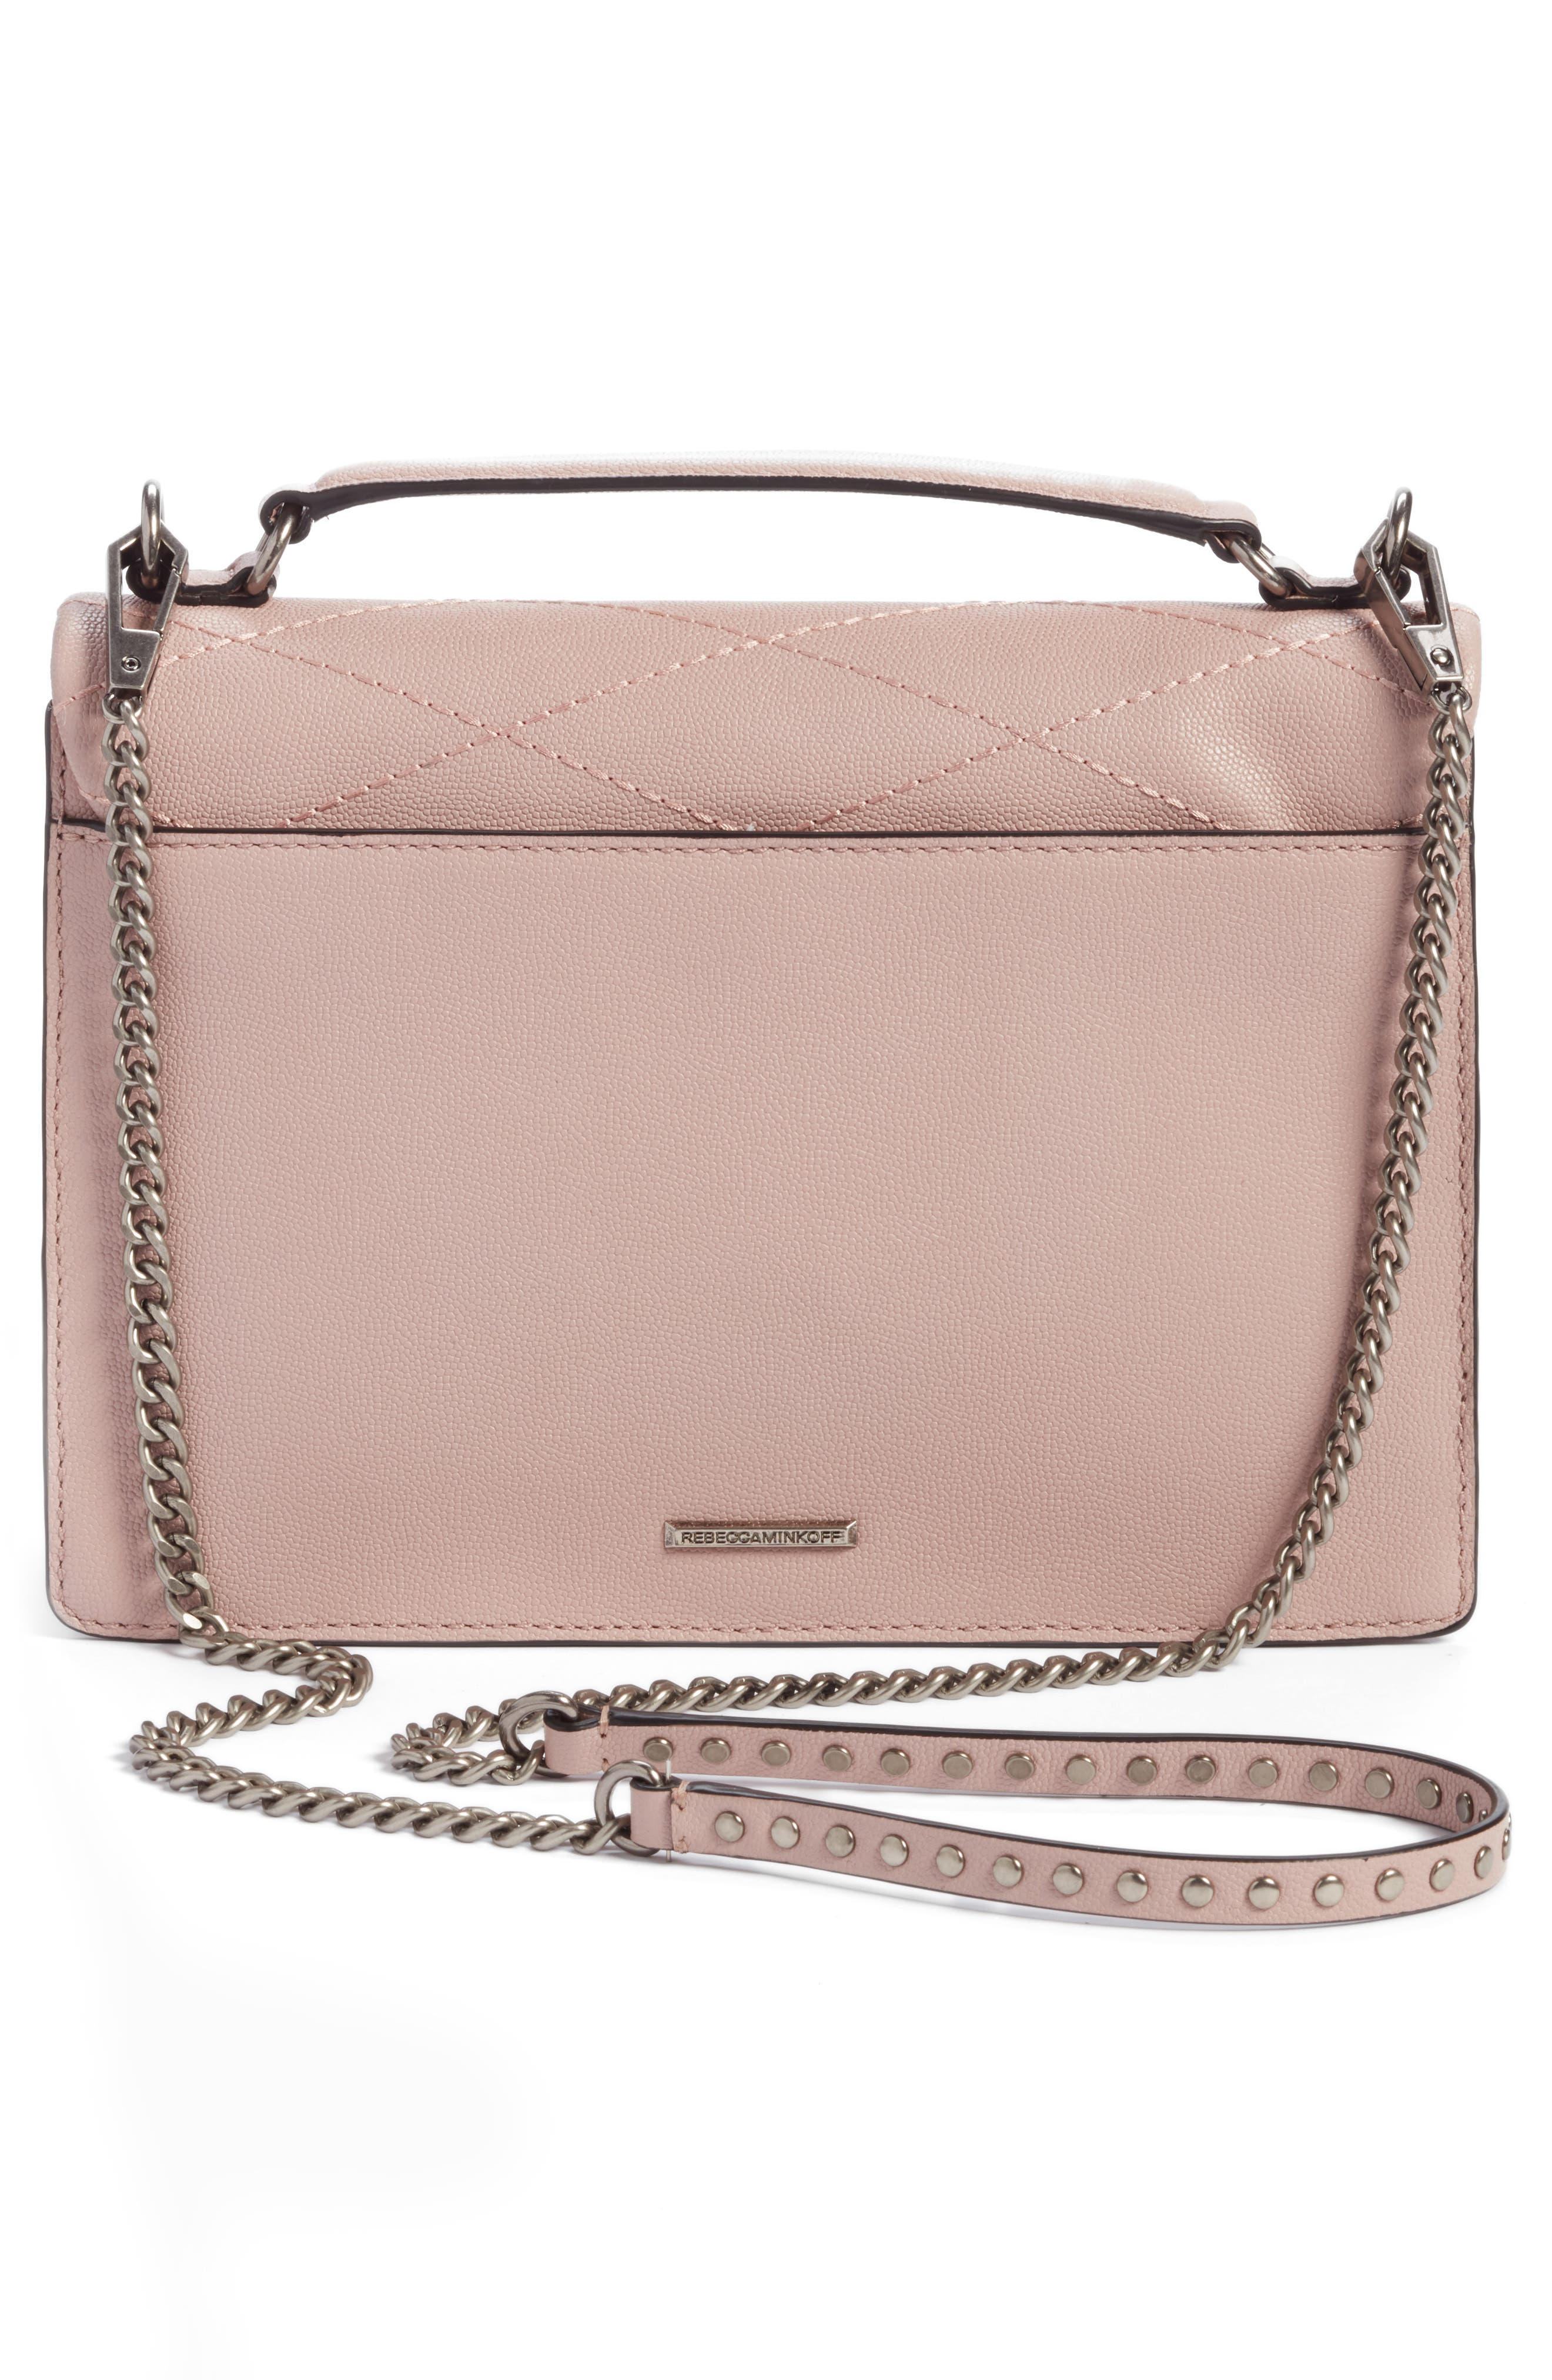 Medium Je T'aime Convertible Leather Crossbody Bag,                             Alternate thumbnail 28, color,